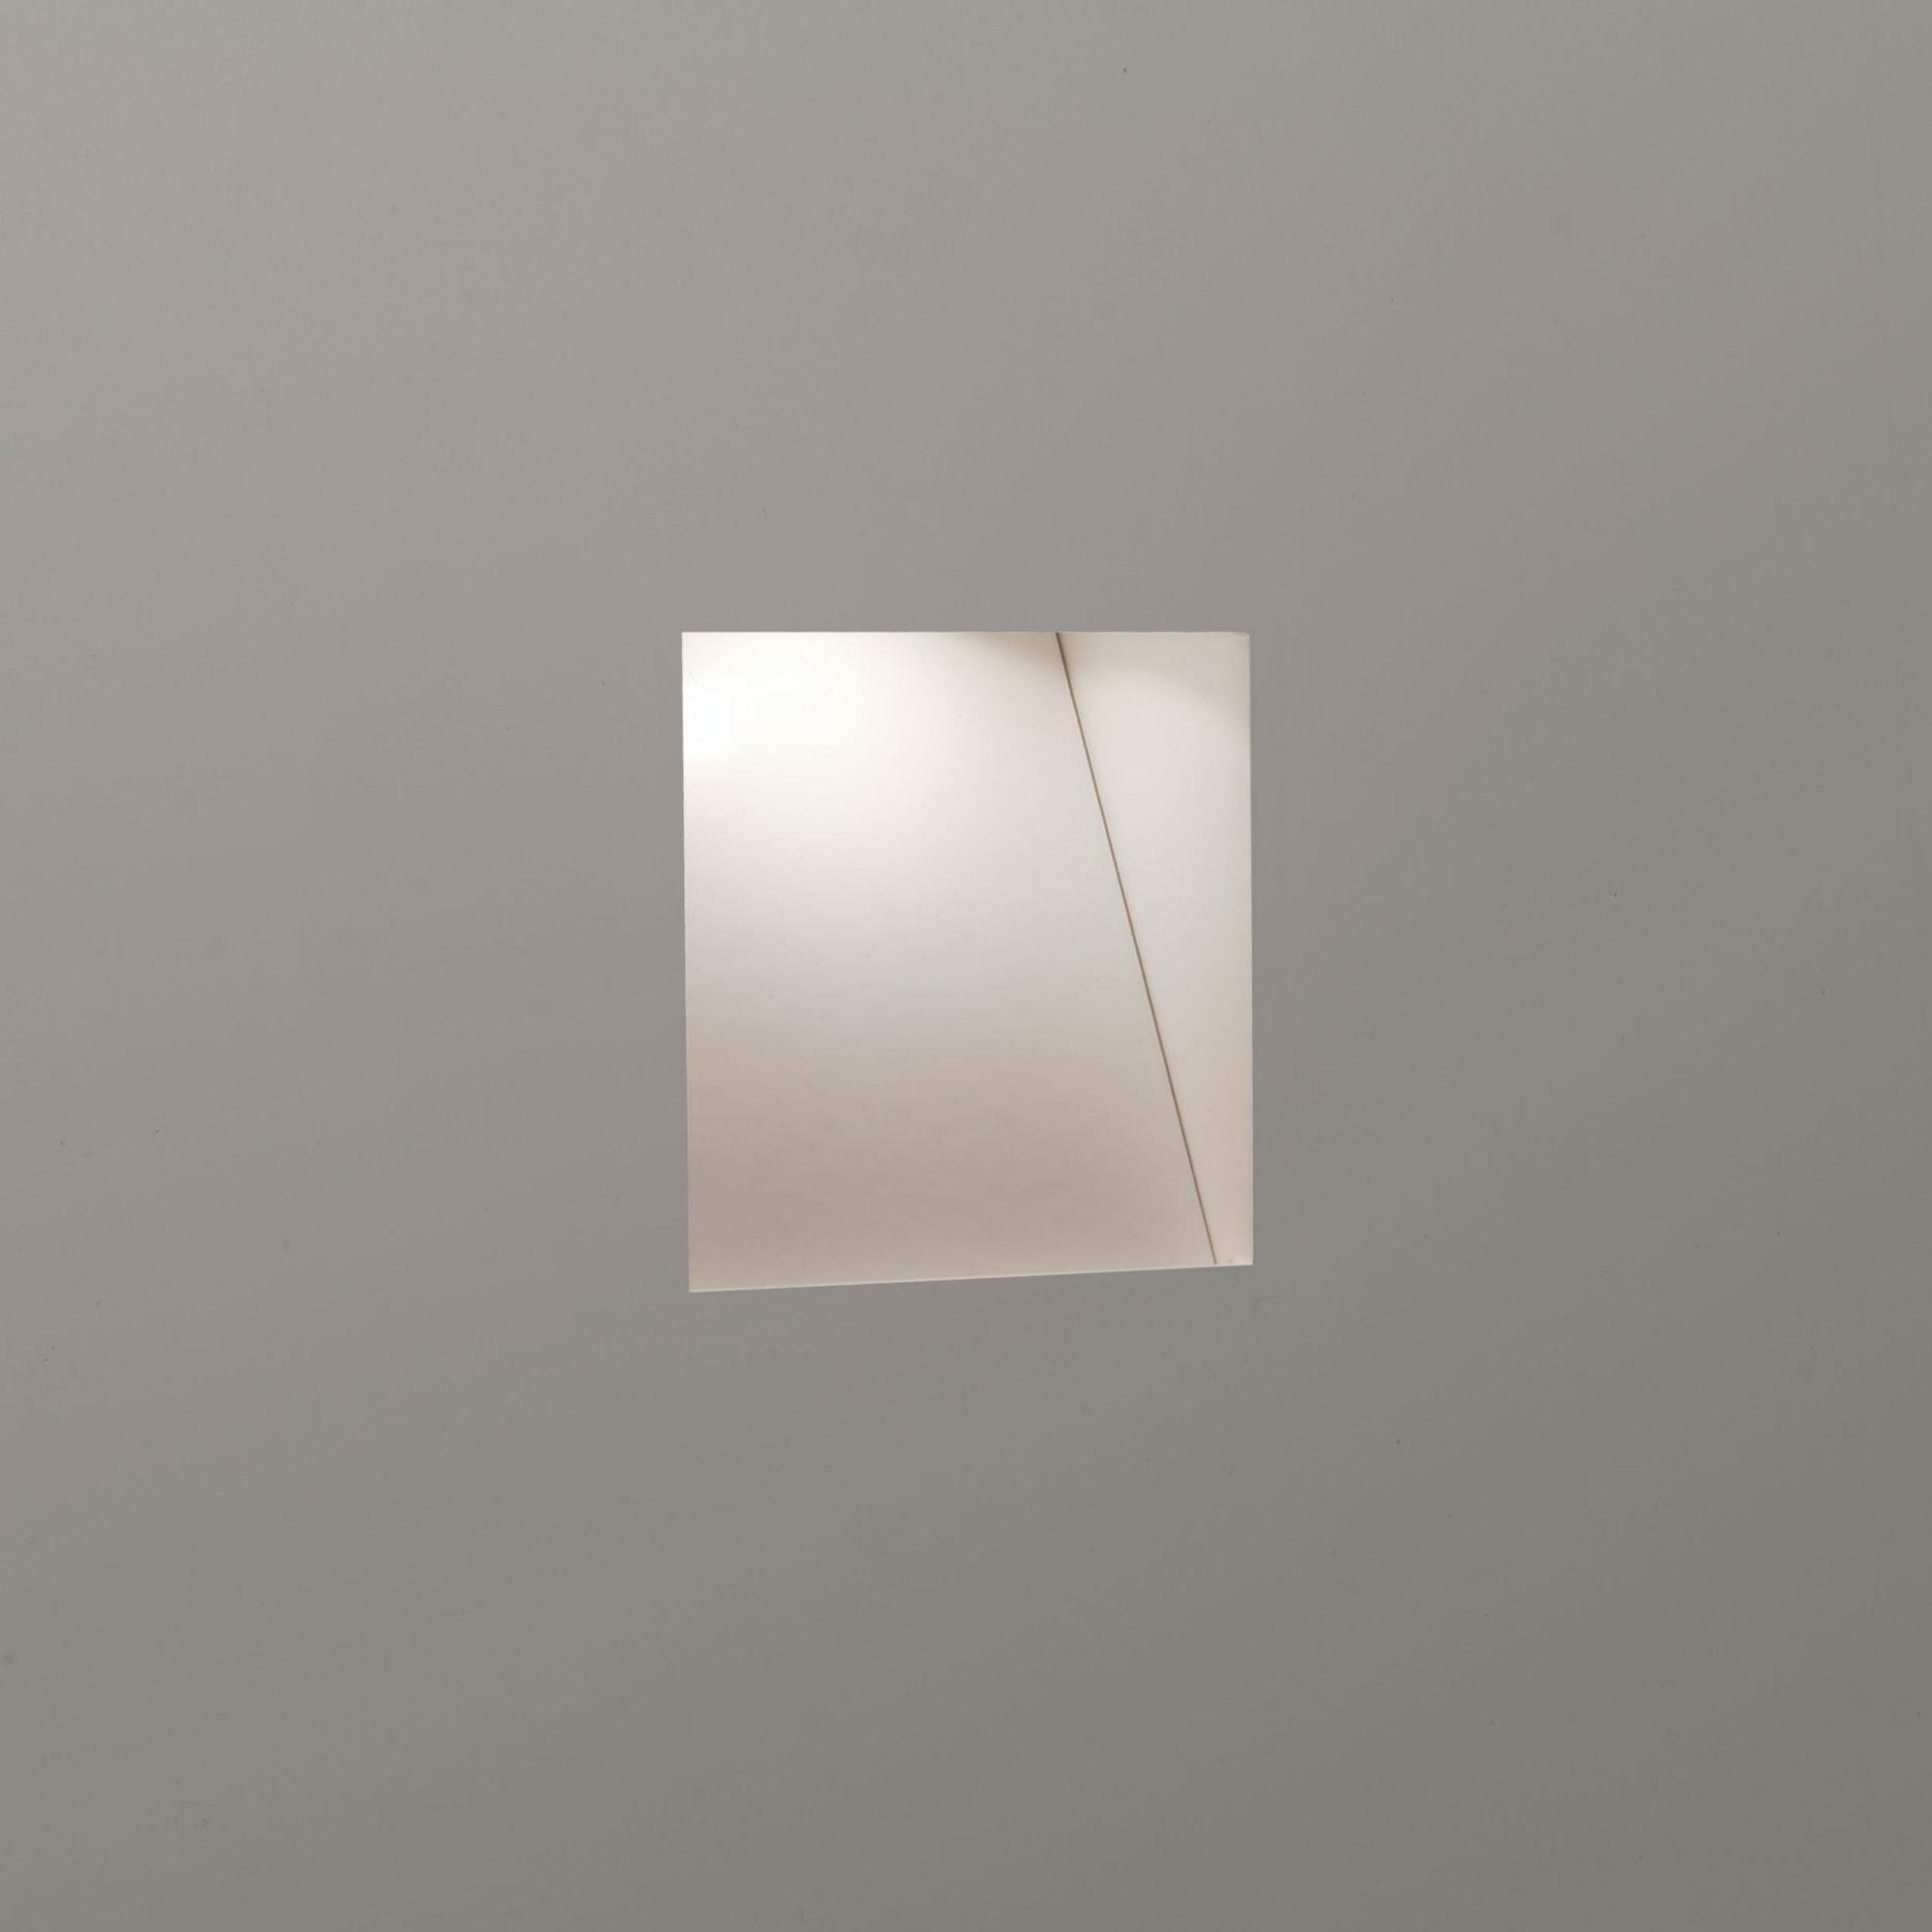 Lampa schodowa Borgo Trimless Mini LED 7625 Astro Lighting